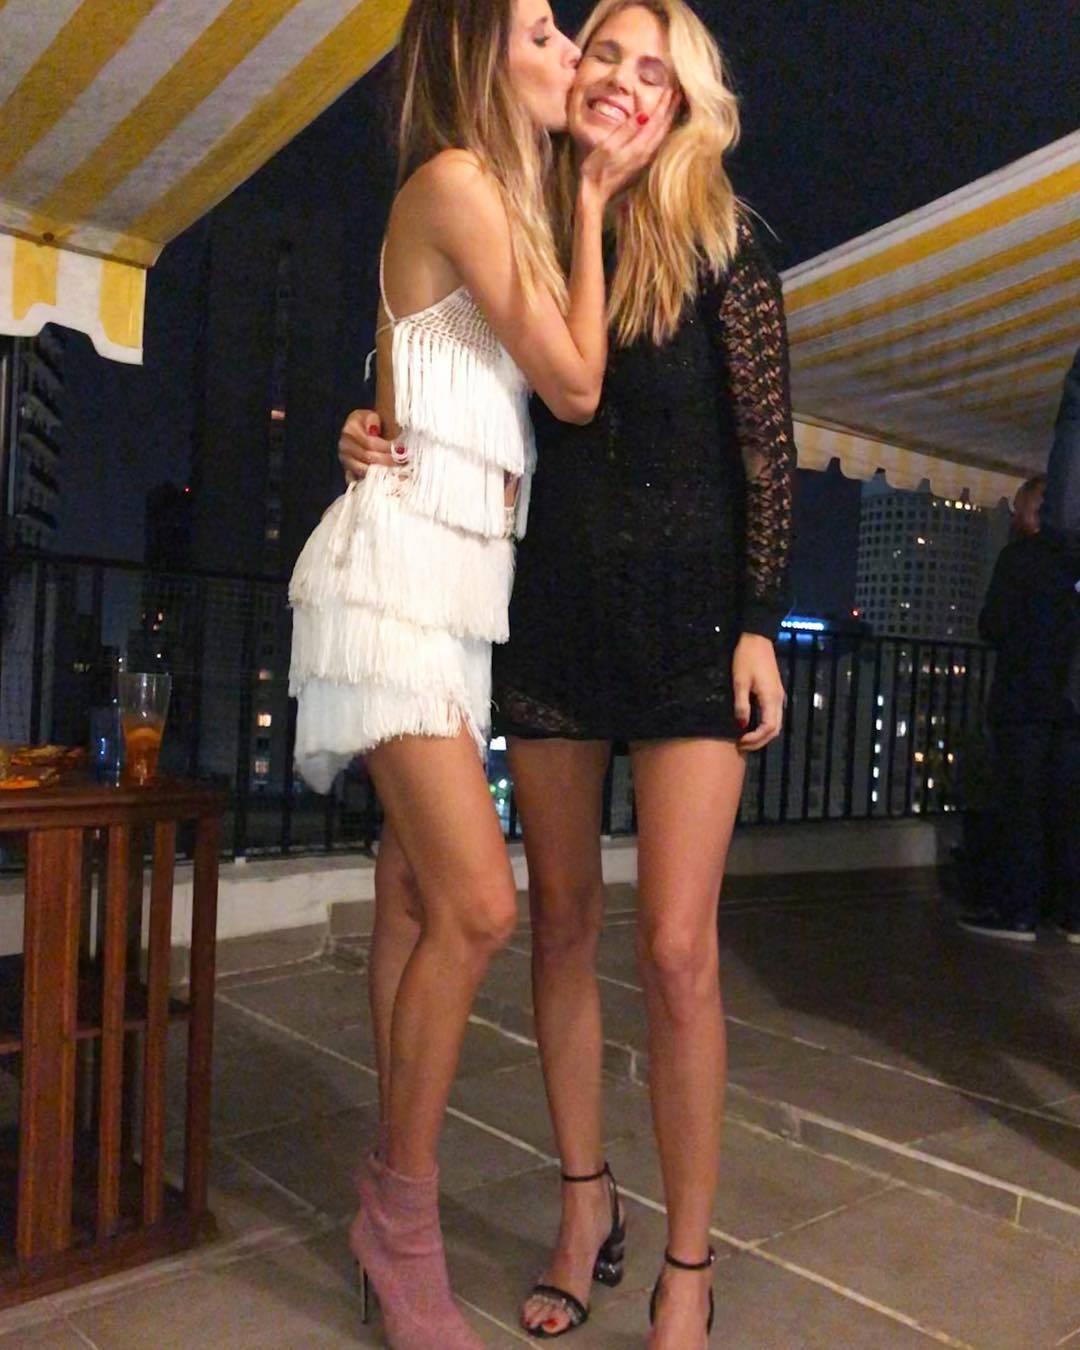 Feet Melina Lezcano nude (64 photos), Topless, Bikini, Instagram, underwear 2020